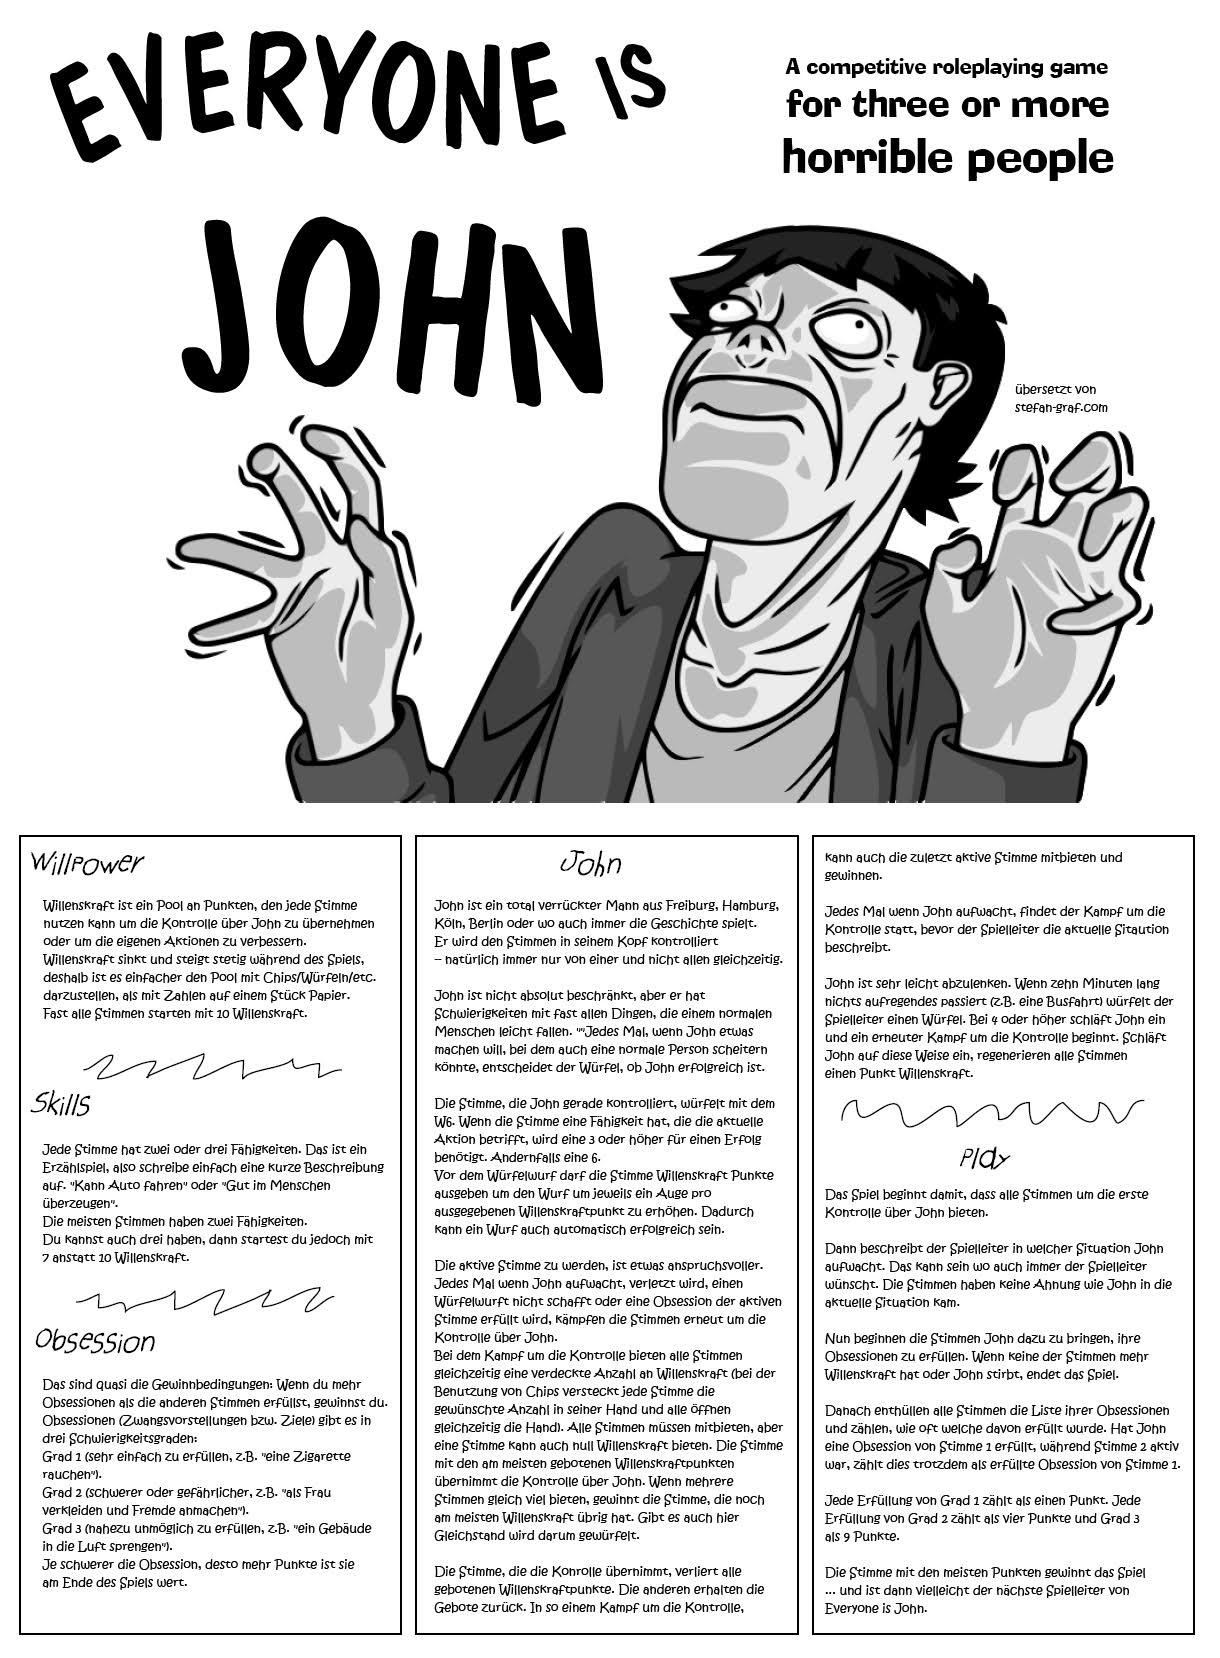 Everione_is_John.jpg